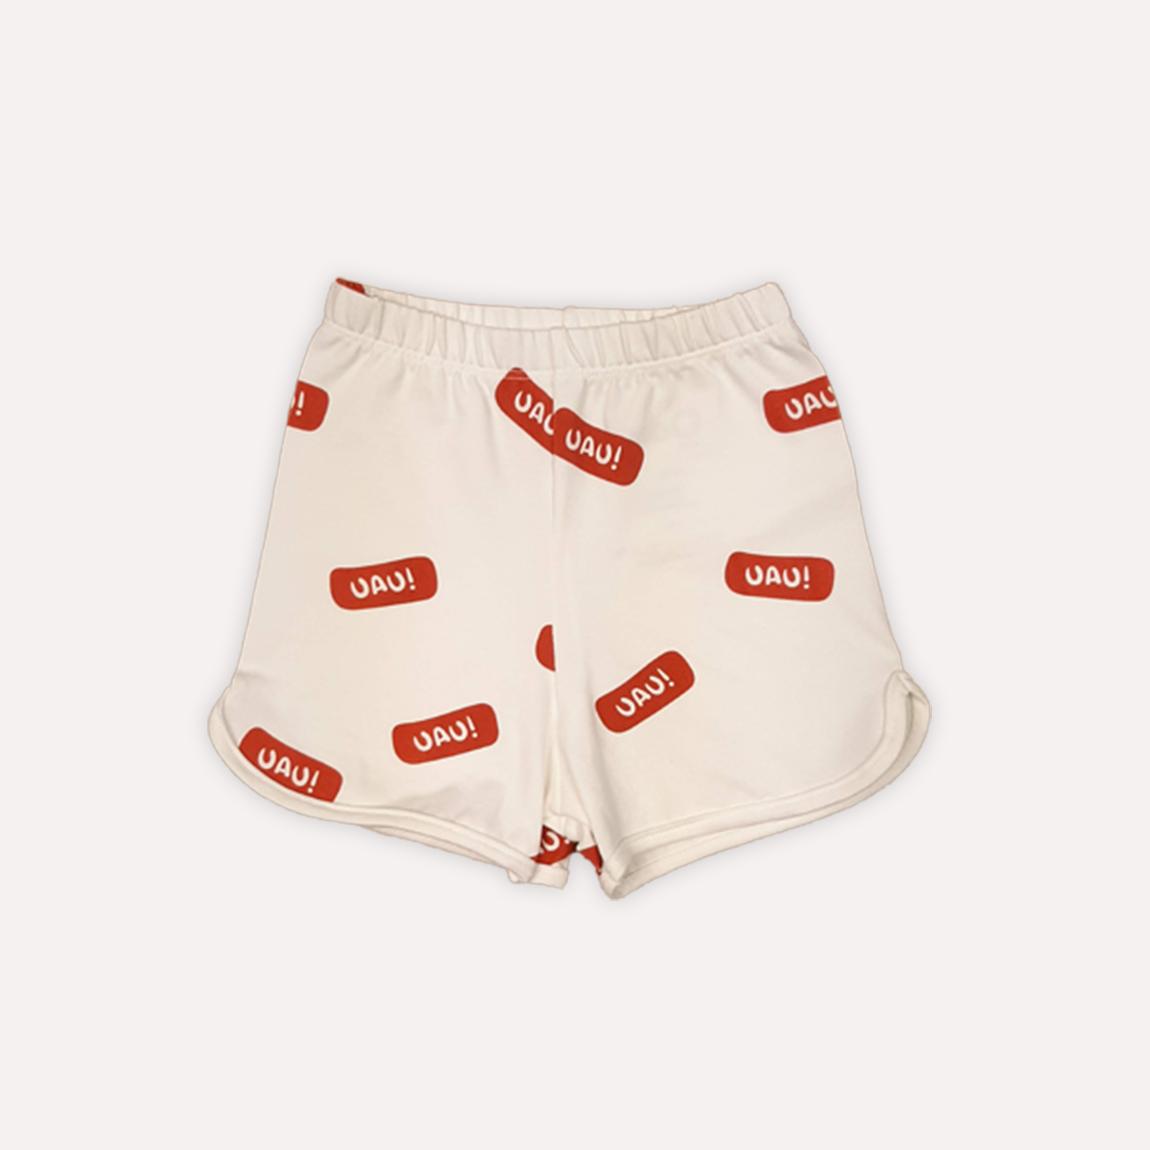 Shorts Uau